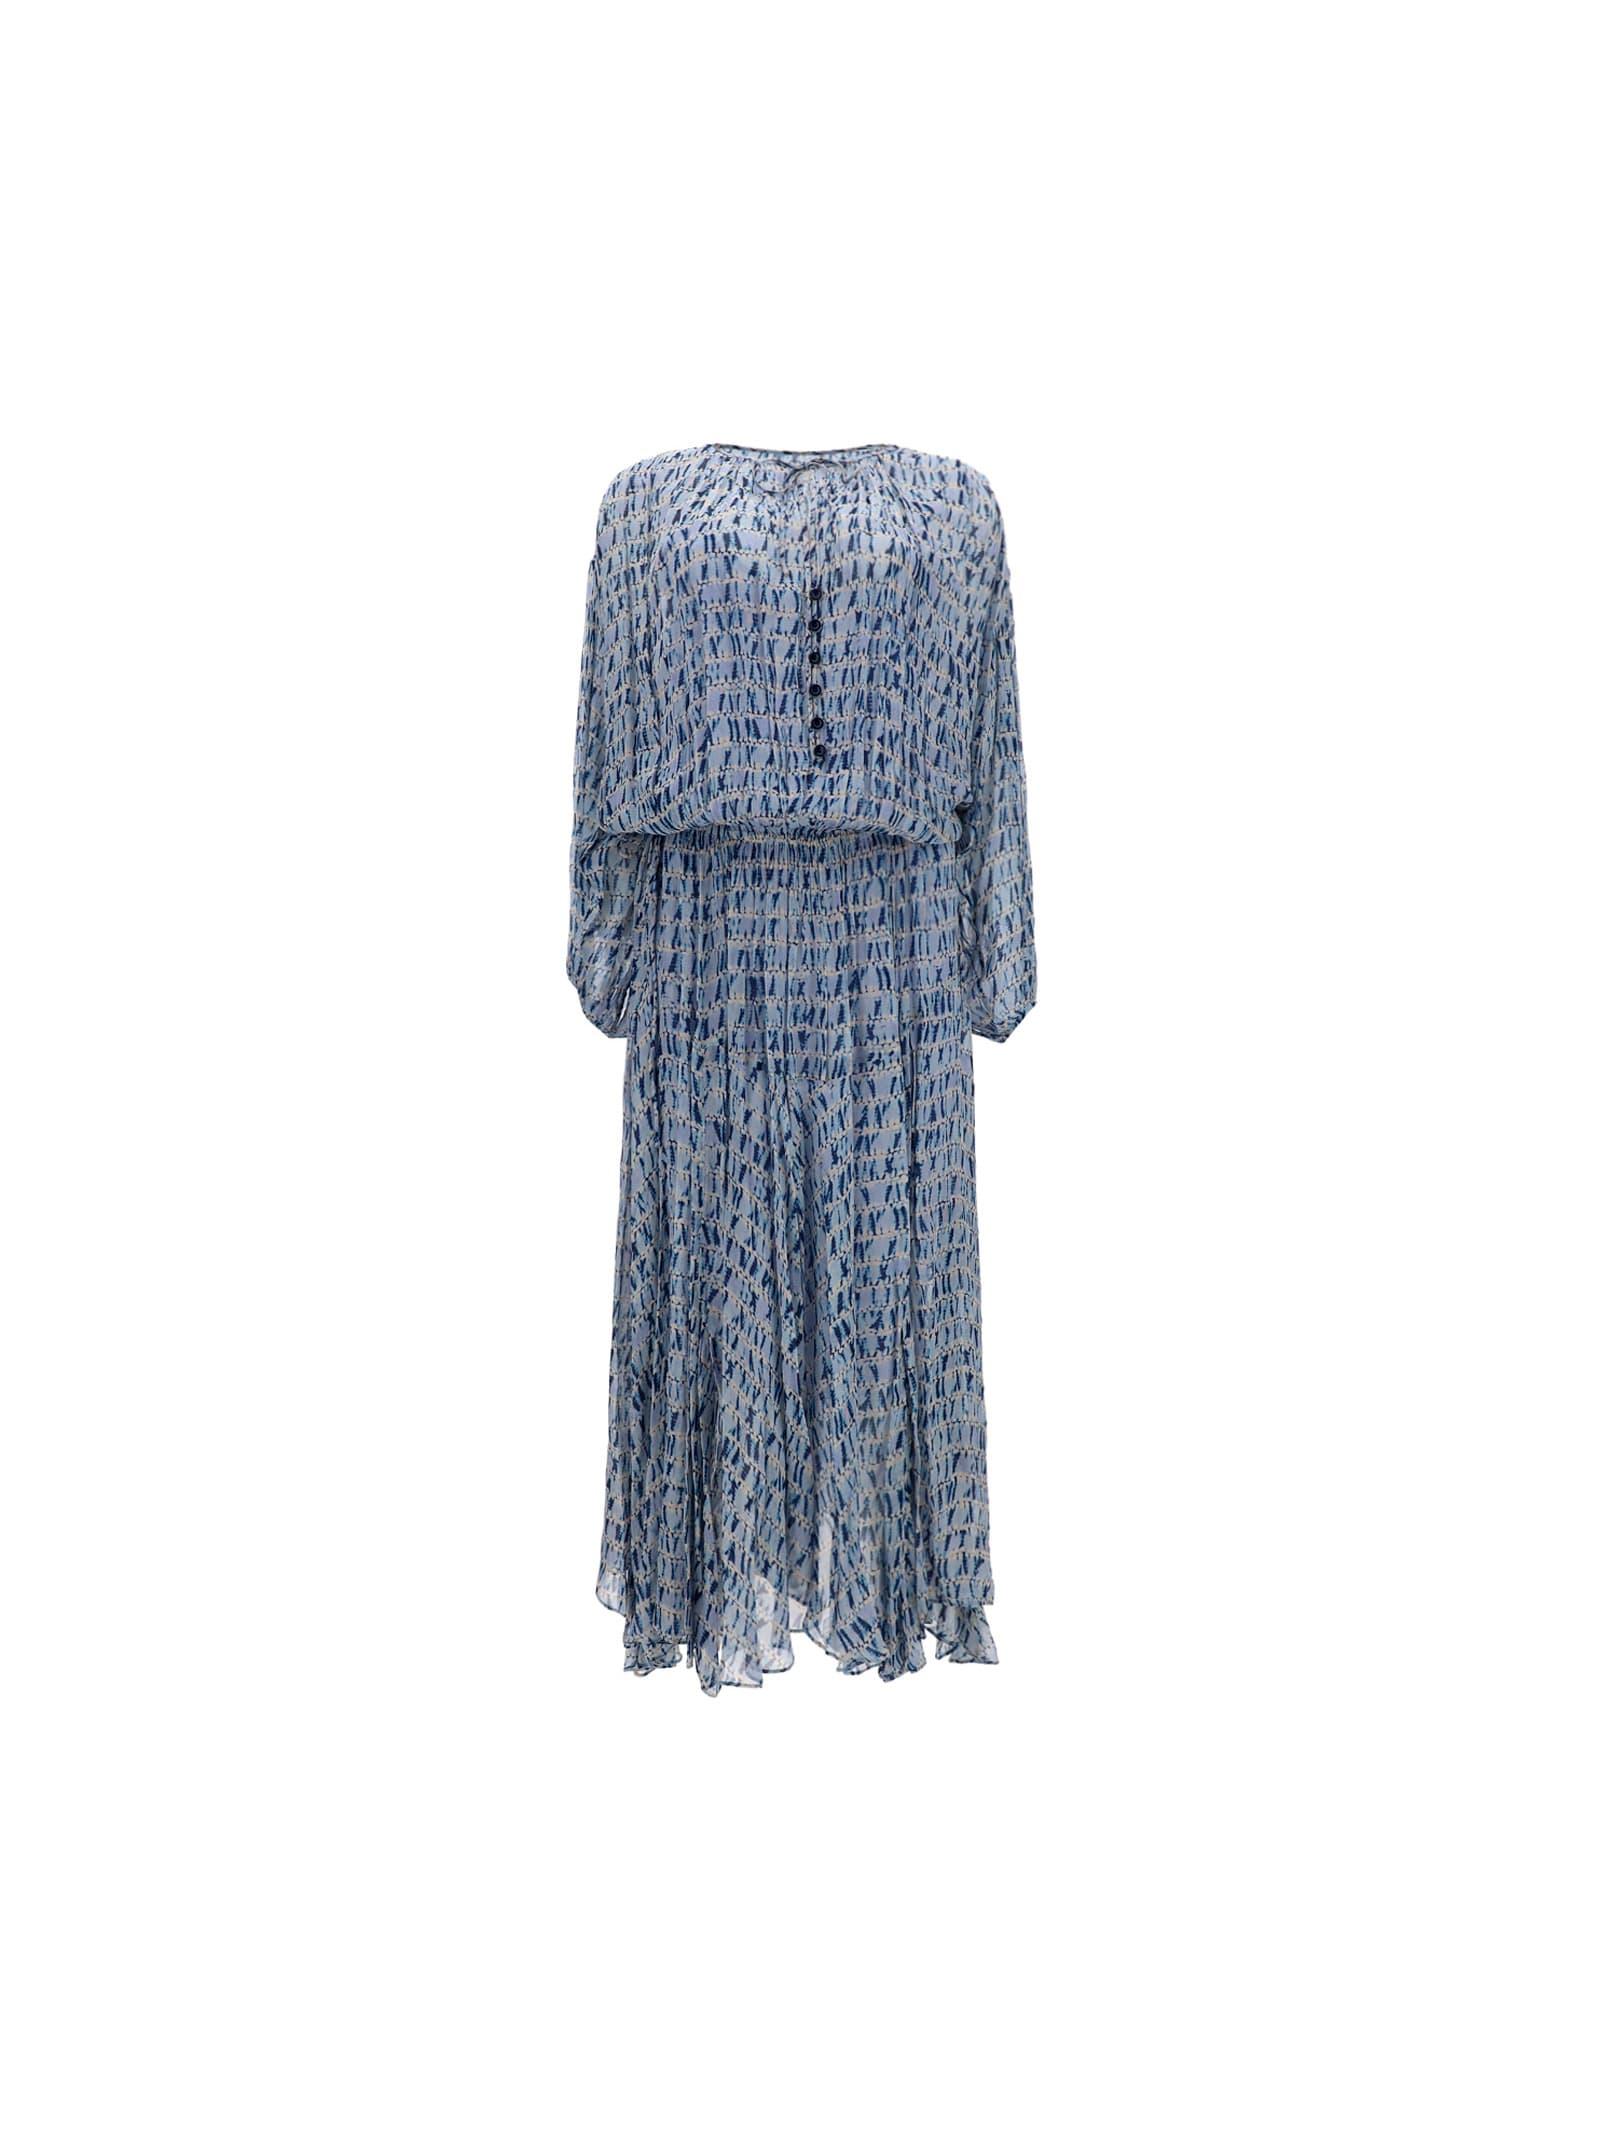 Isabel Marant Dresses ETOILE DRESS